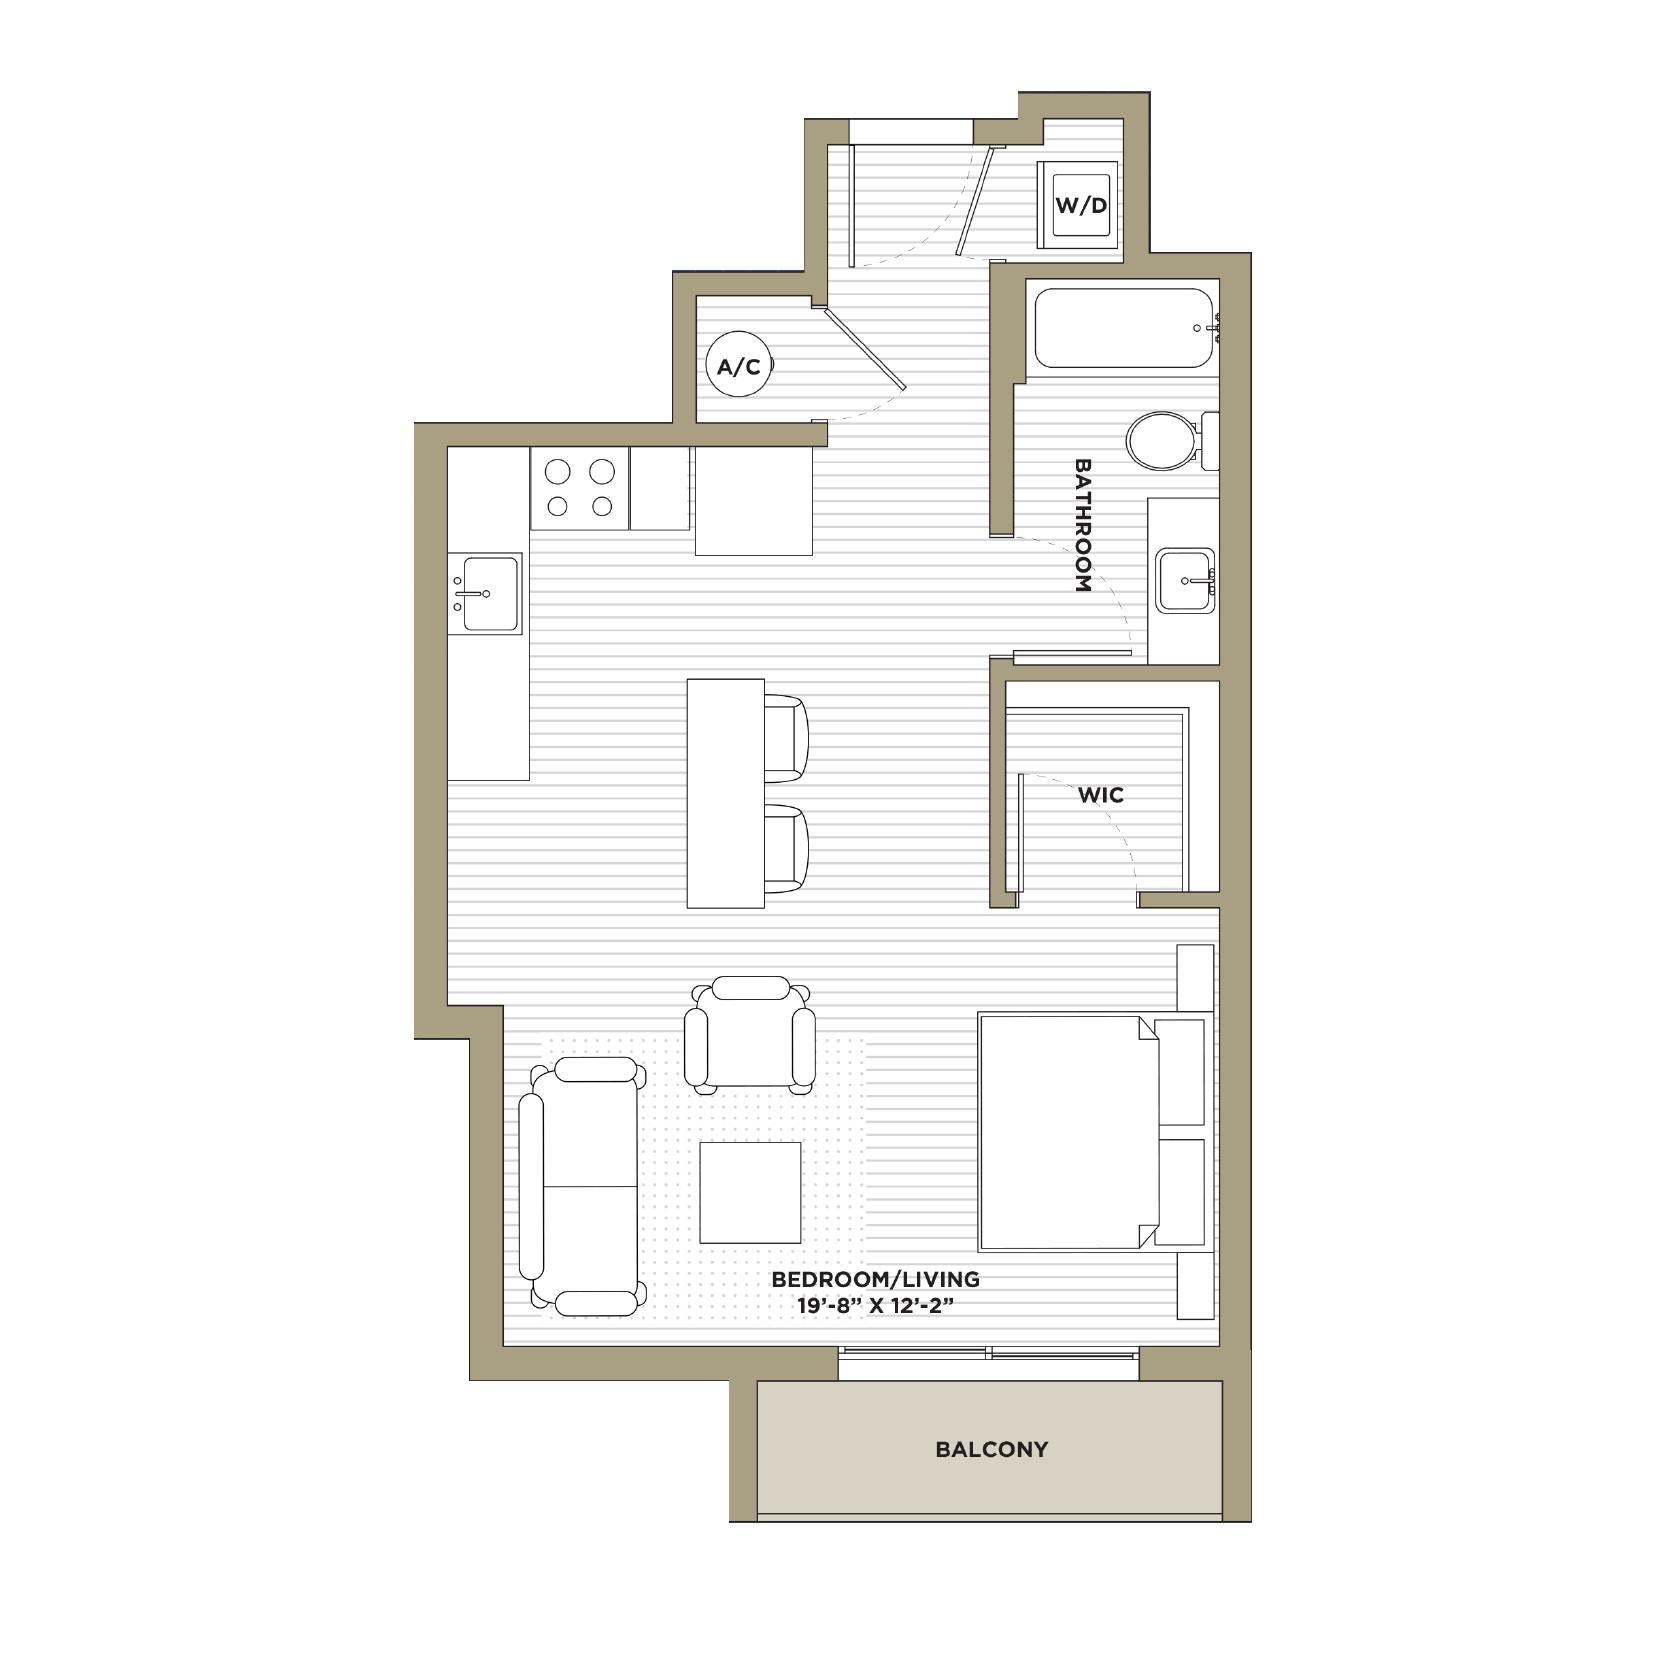 S1 - Studio / 1 Bathroom585 sq. ft.